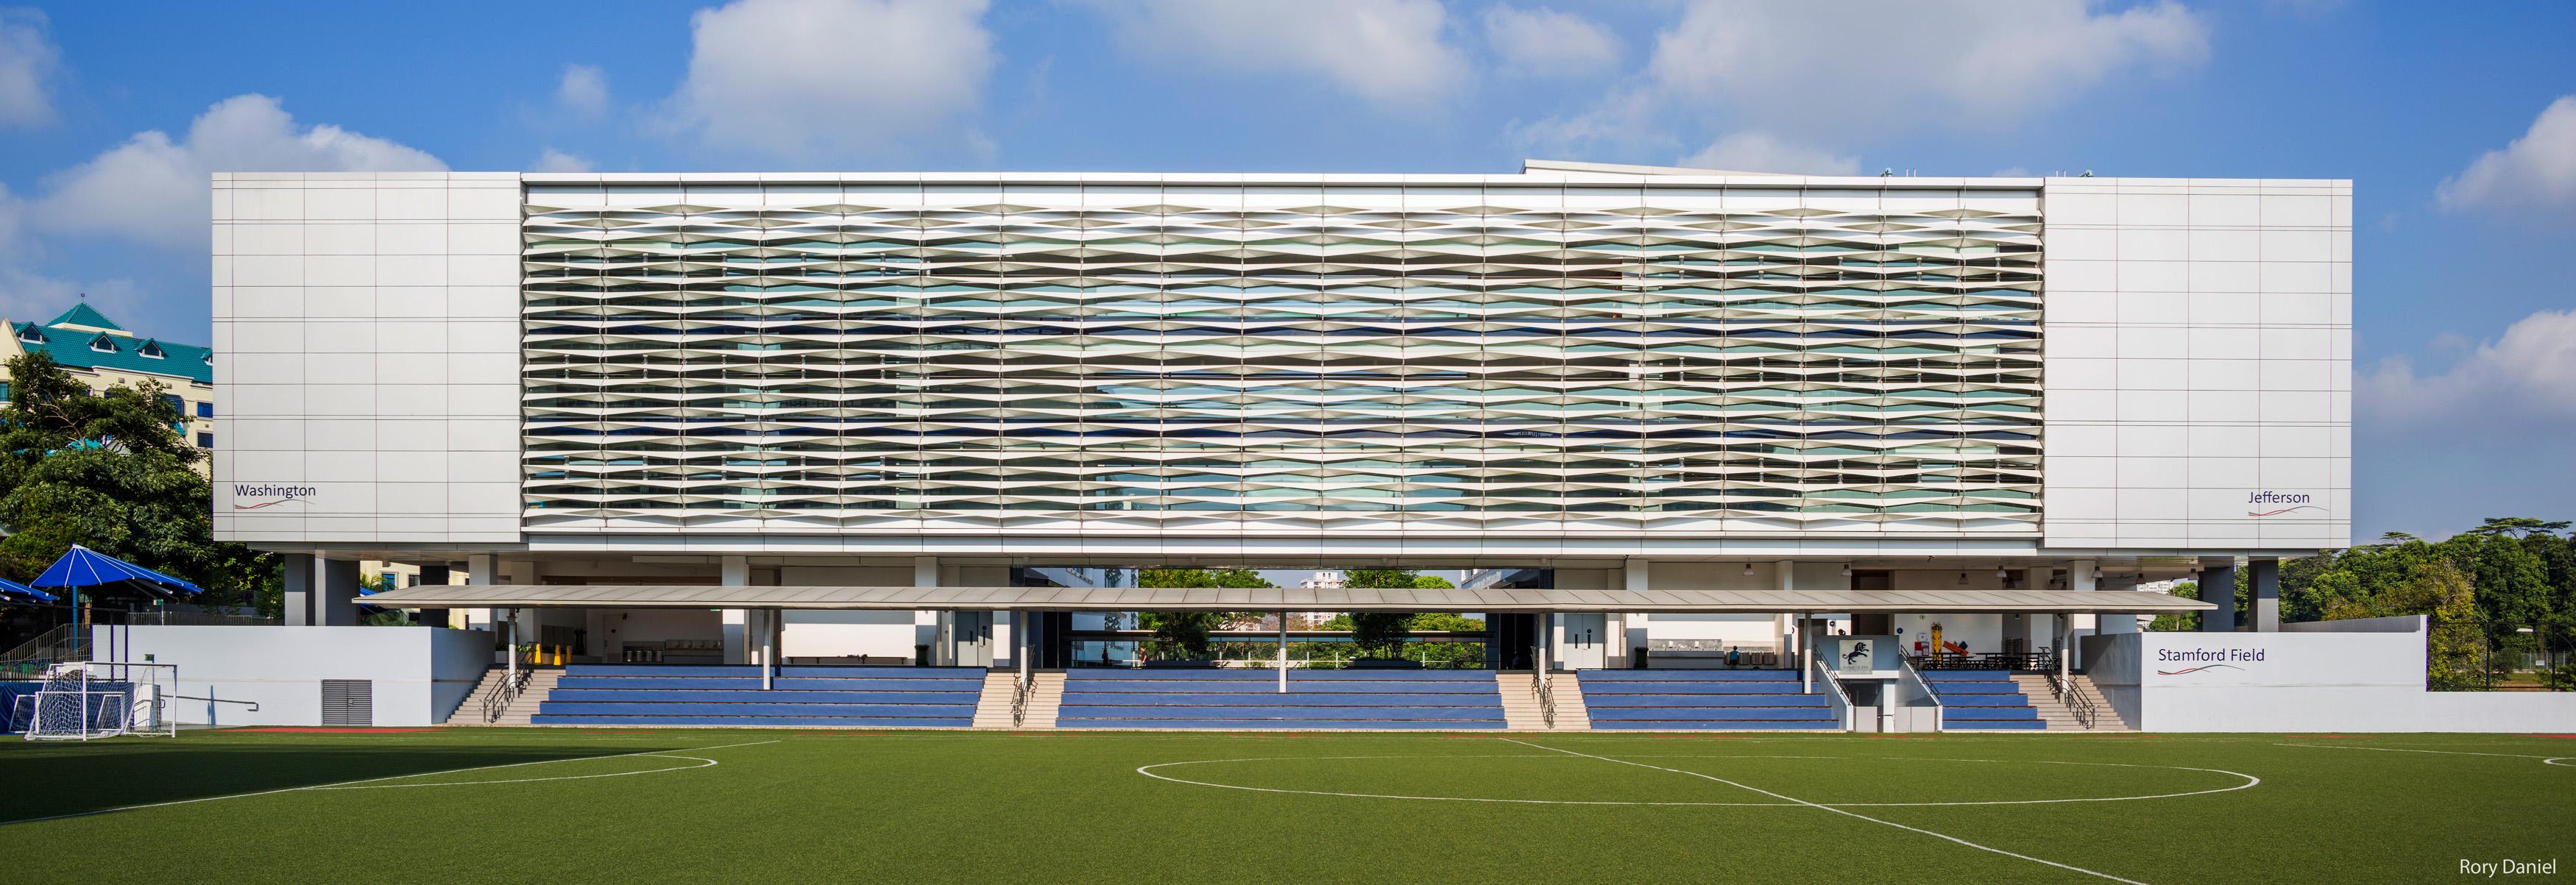 Scuola Italiana Singapore. Photo: SAIS